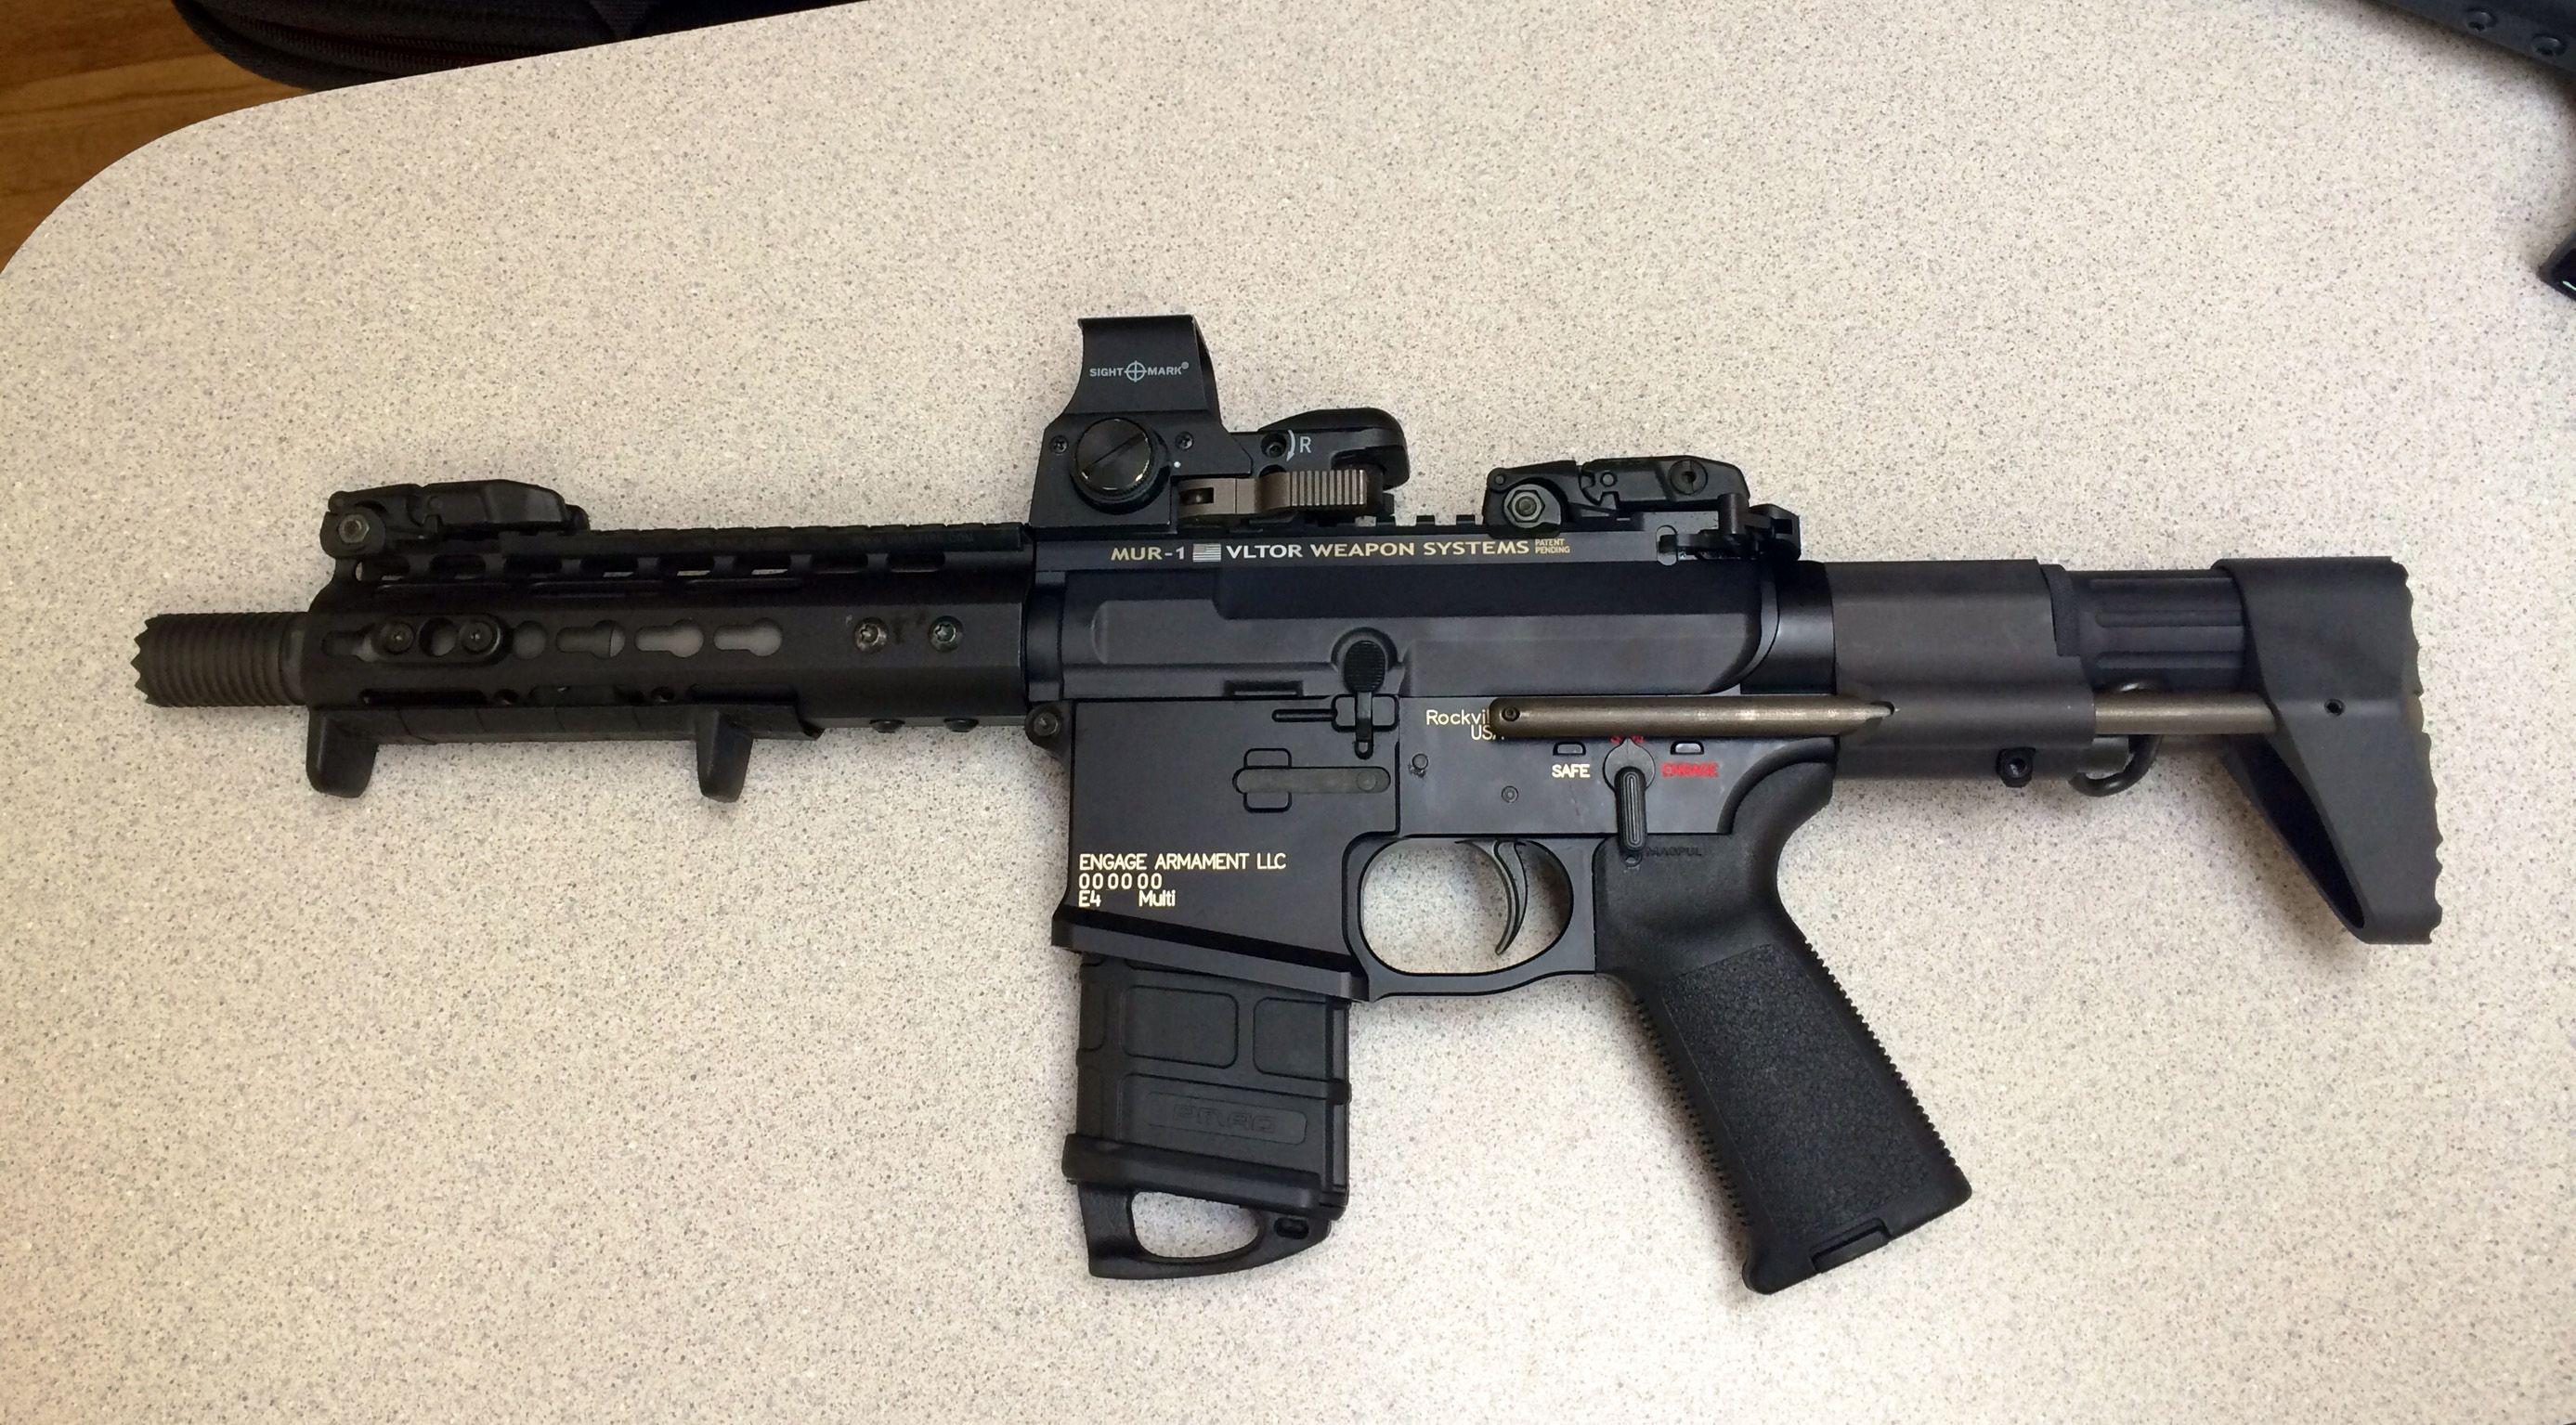 Engage Armament E4 PDW with NEA CCS Stock, Noveske Diplomat